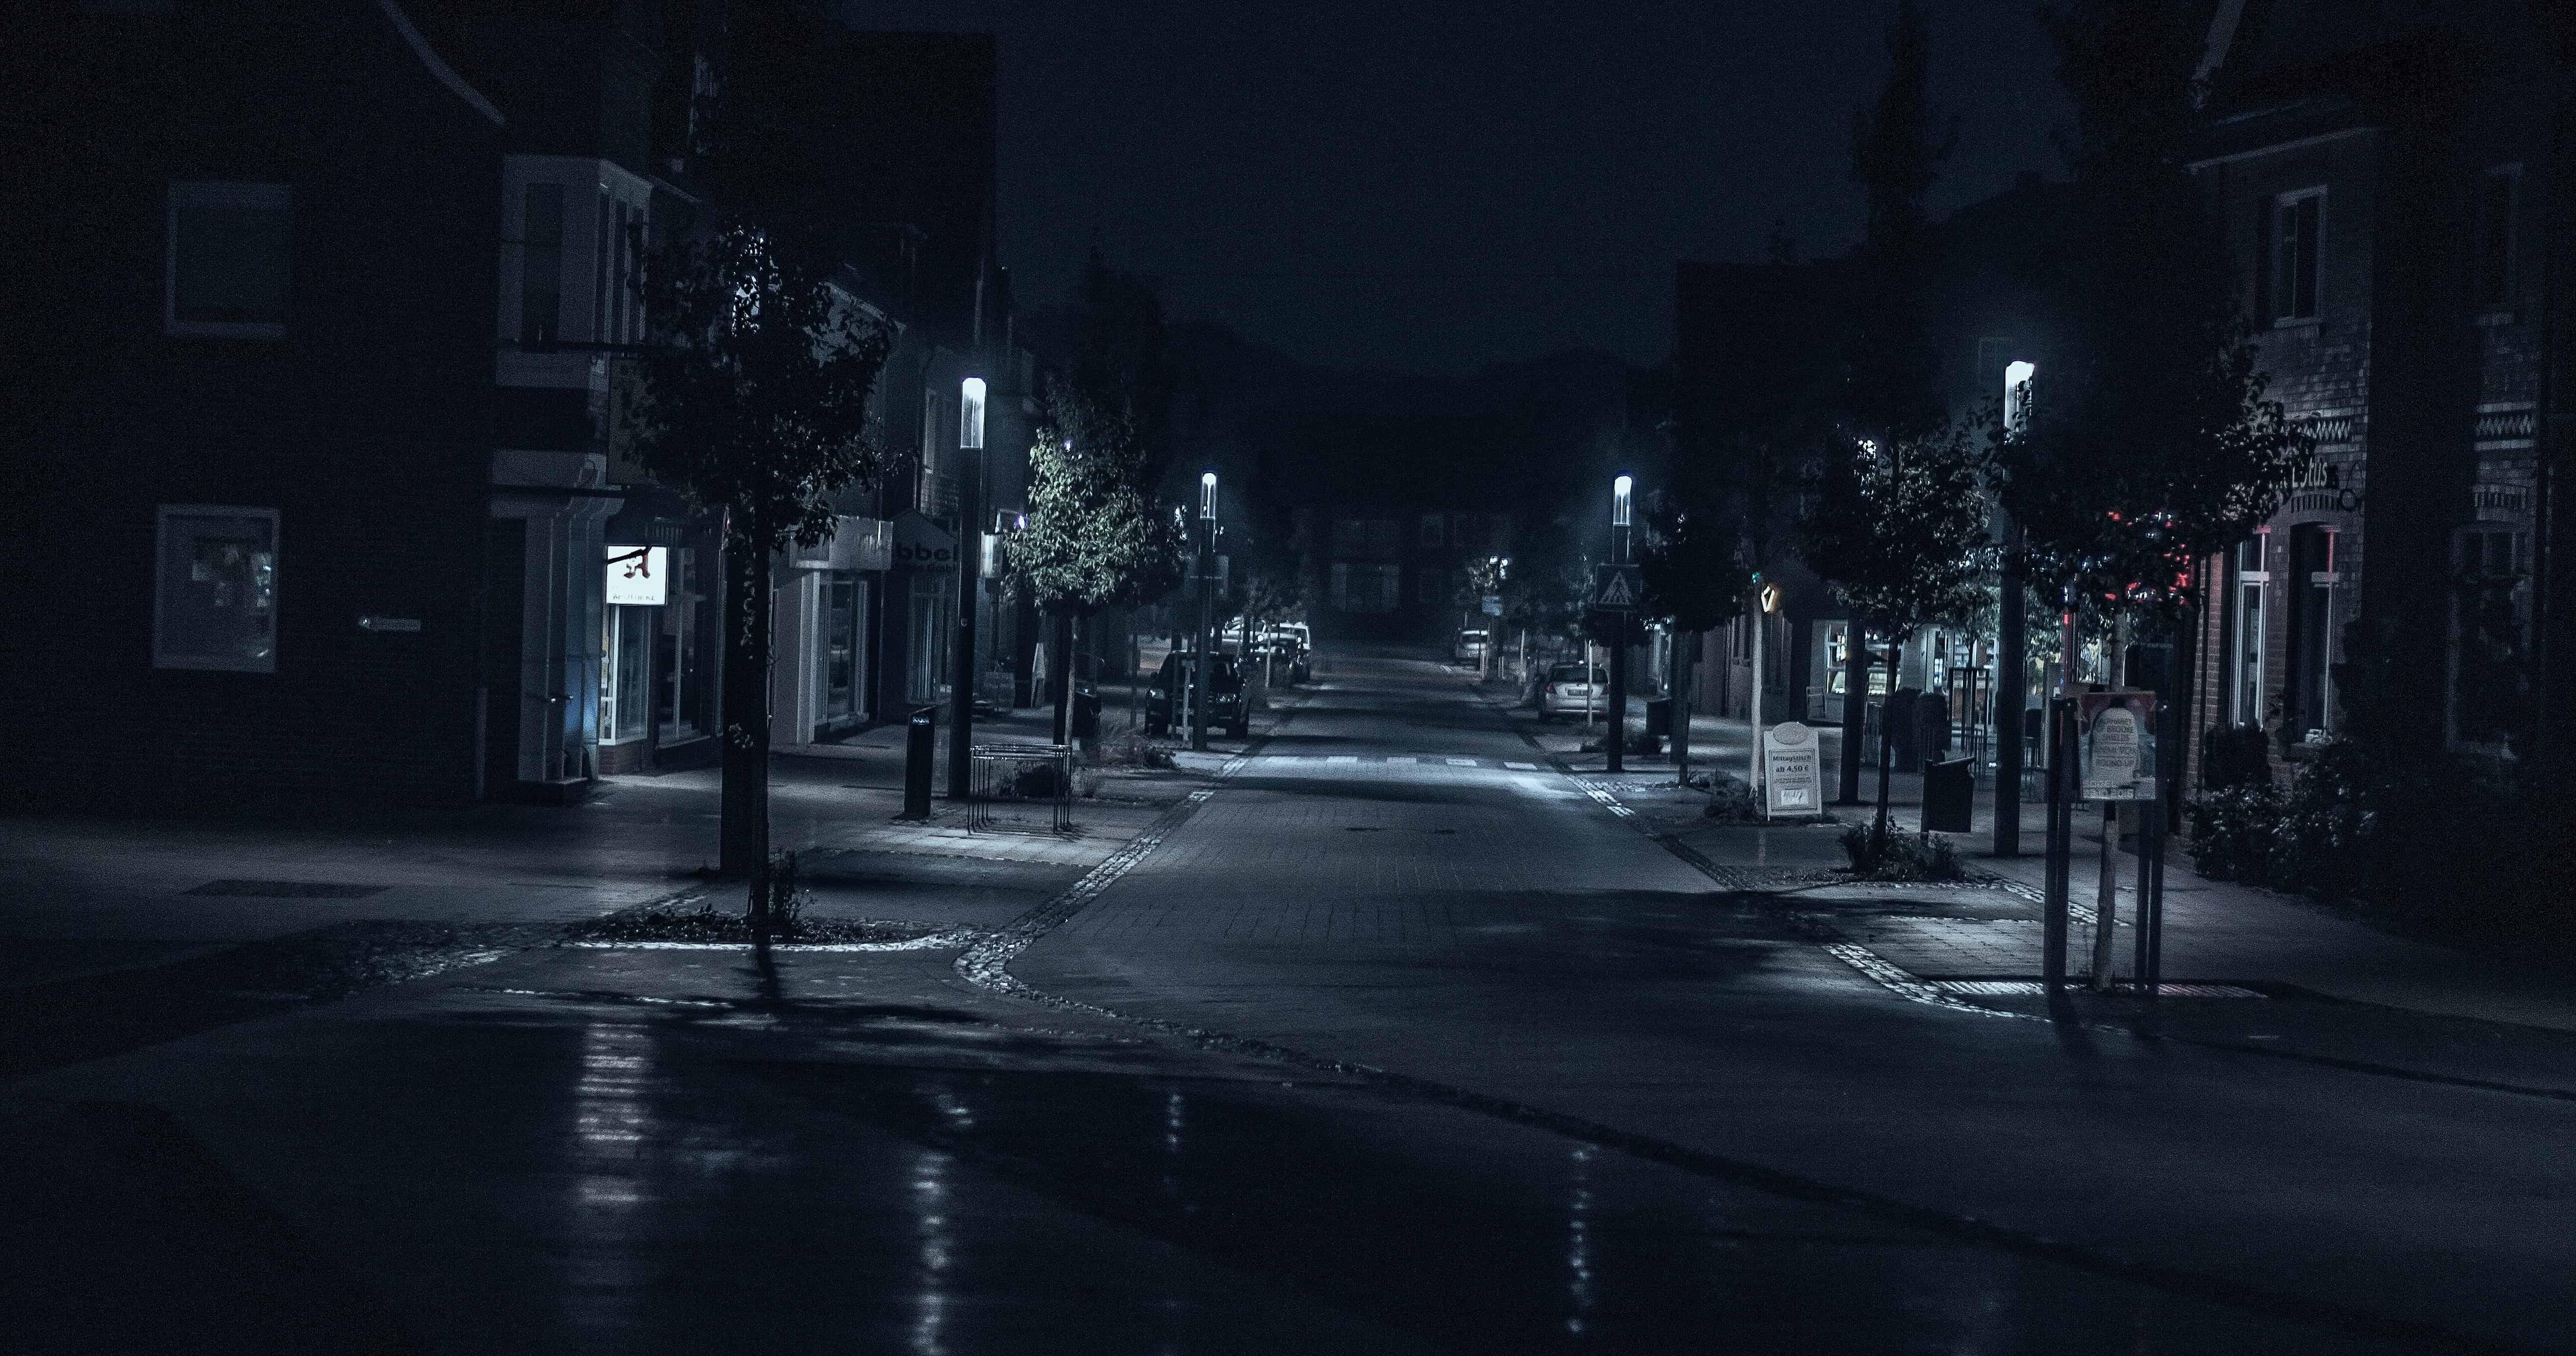 Beautiful Dark Wallpaper - Far Can Ring Doorbells See At Night - HD Wallpaper